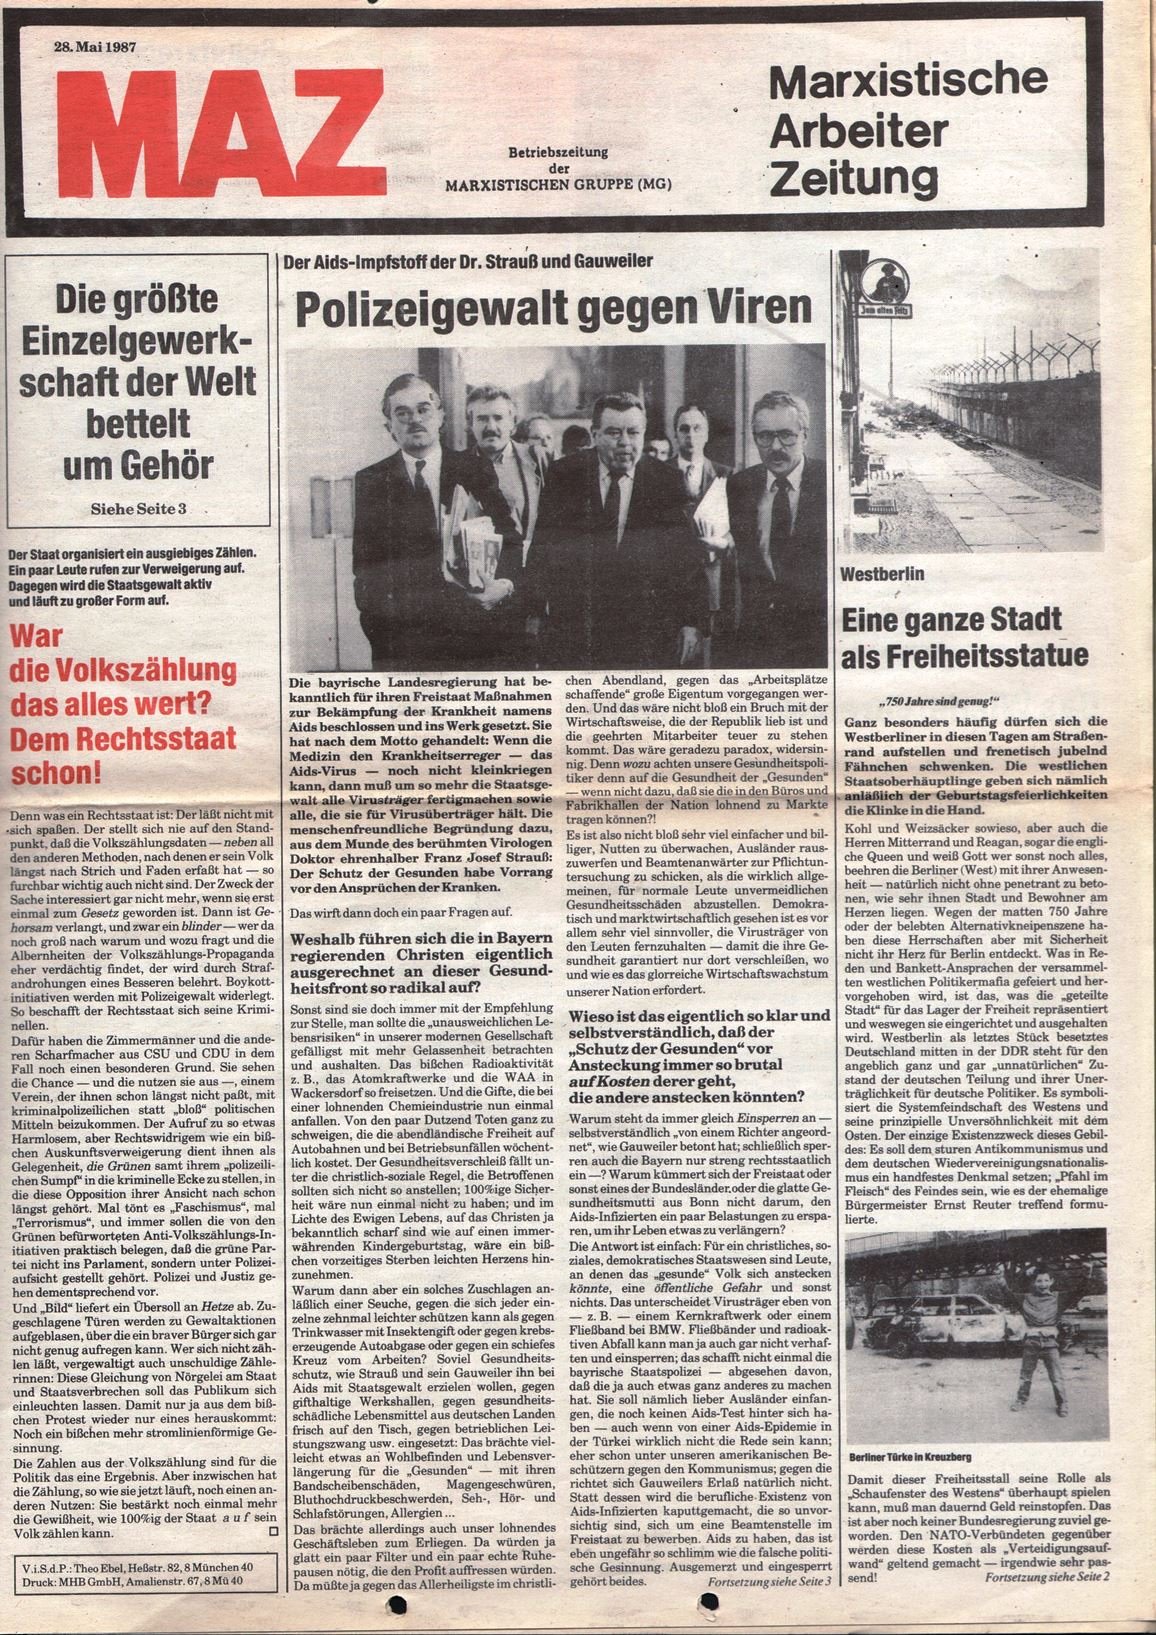 Muenchen_MG_MAZ_19870528_01